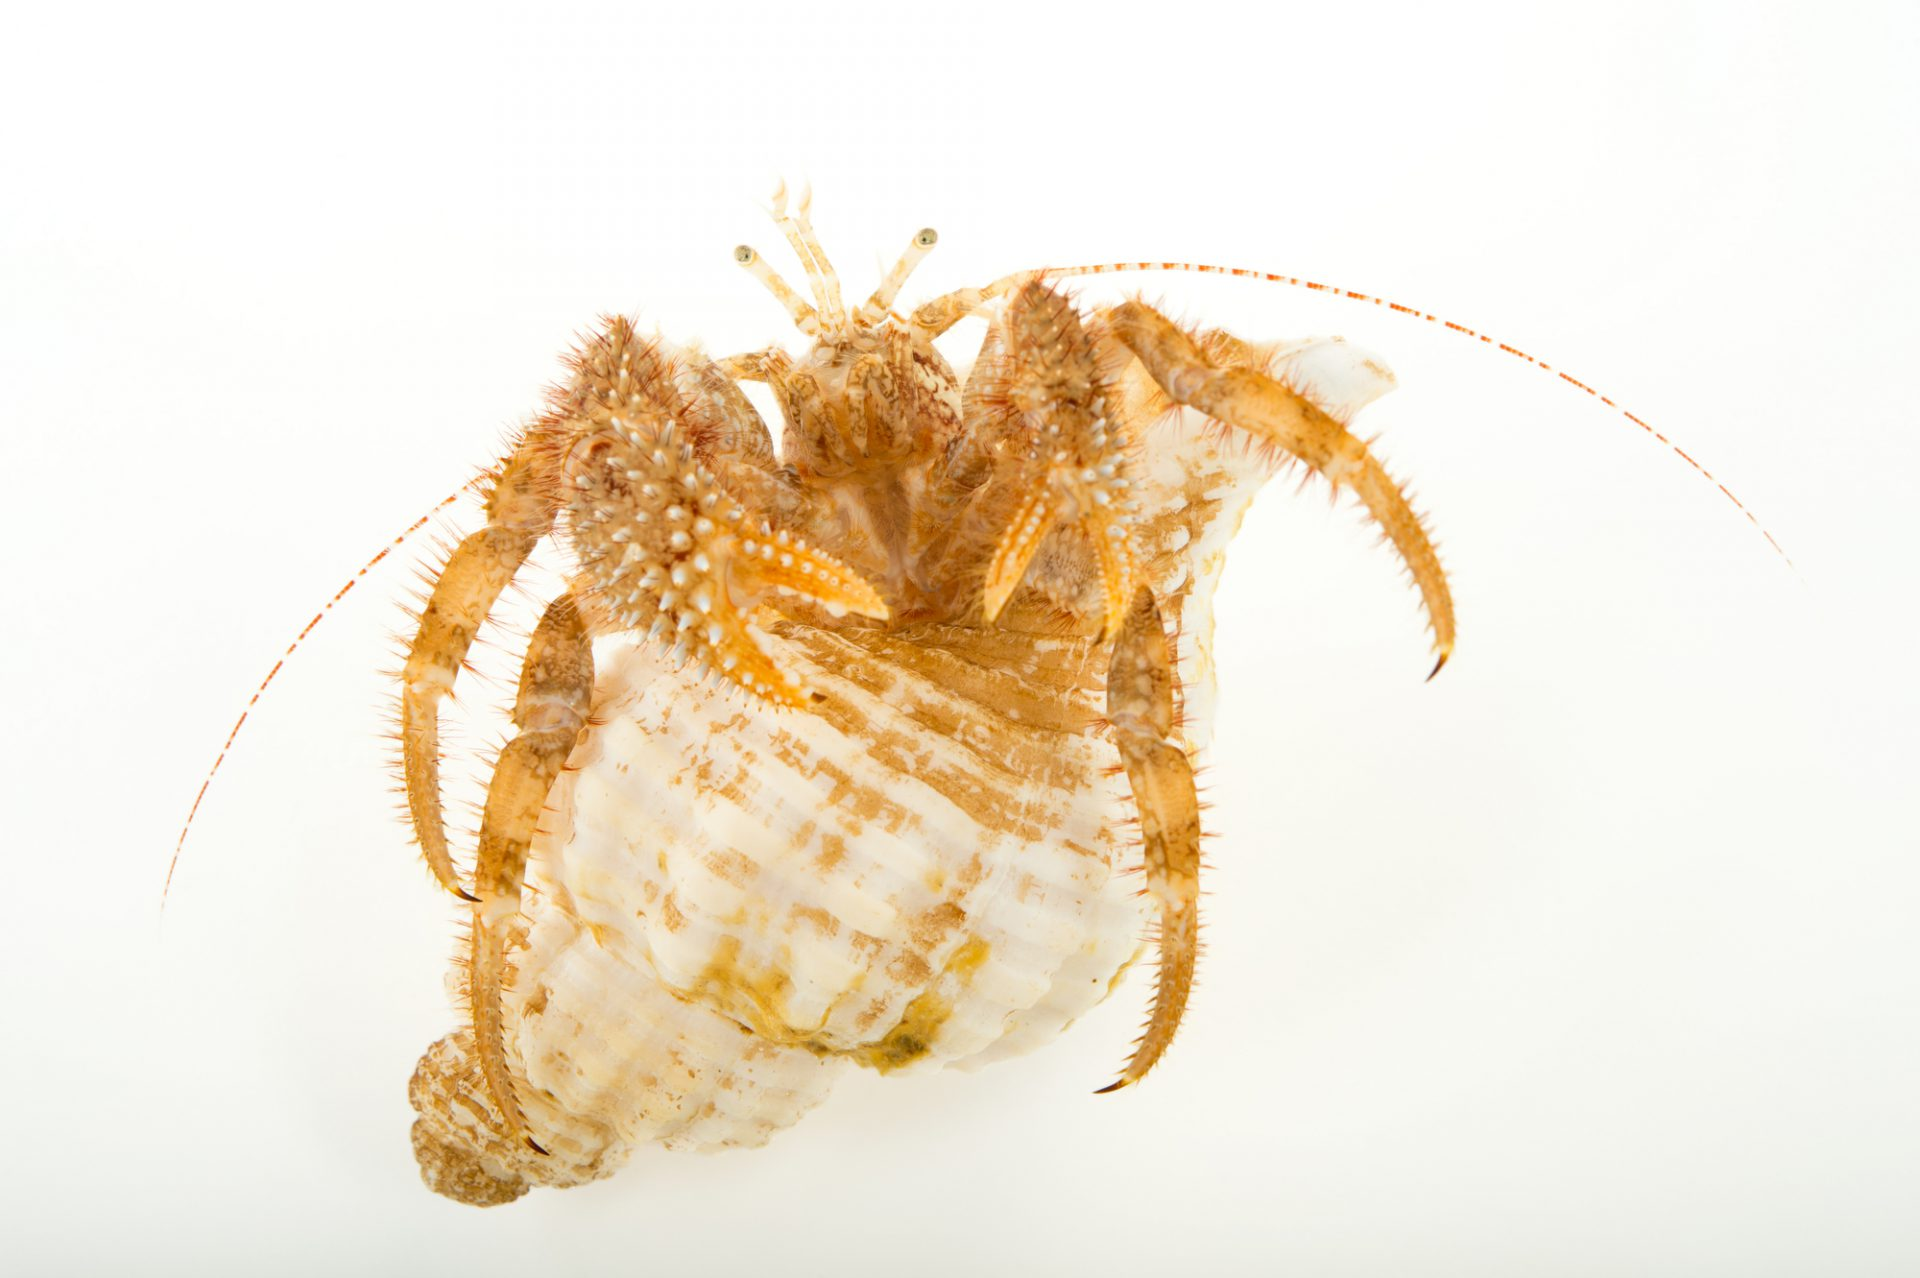 Photo: Blue spine hermit crab (Pagurus kennerlyi) at the Alaska SeaLife Center.